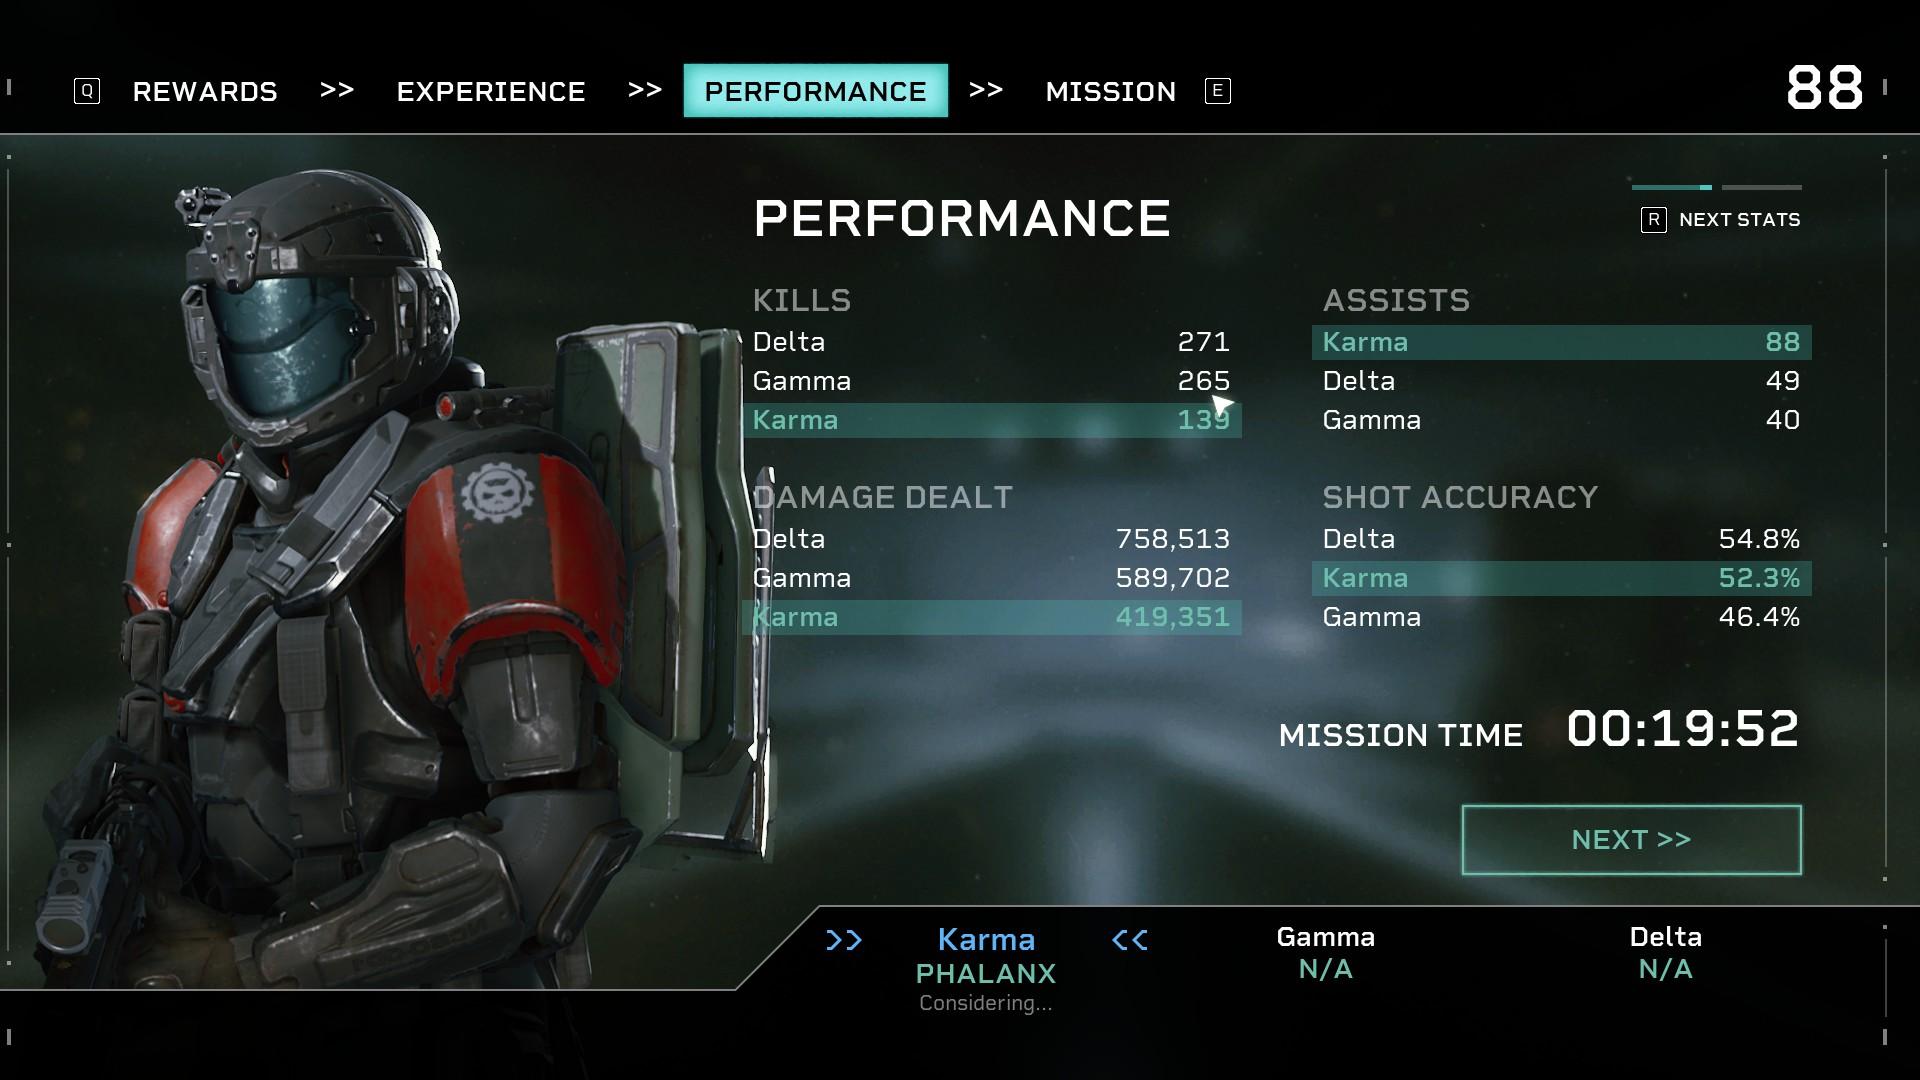 Aliens: Fireteam Elite - New Mod + Installation Guide in Game - Battle Synths - 6524018